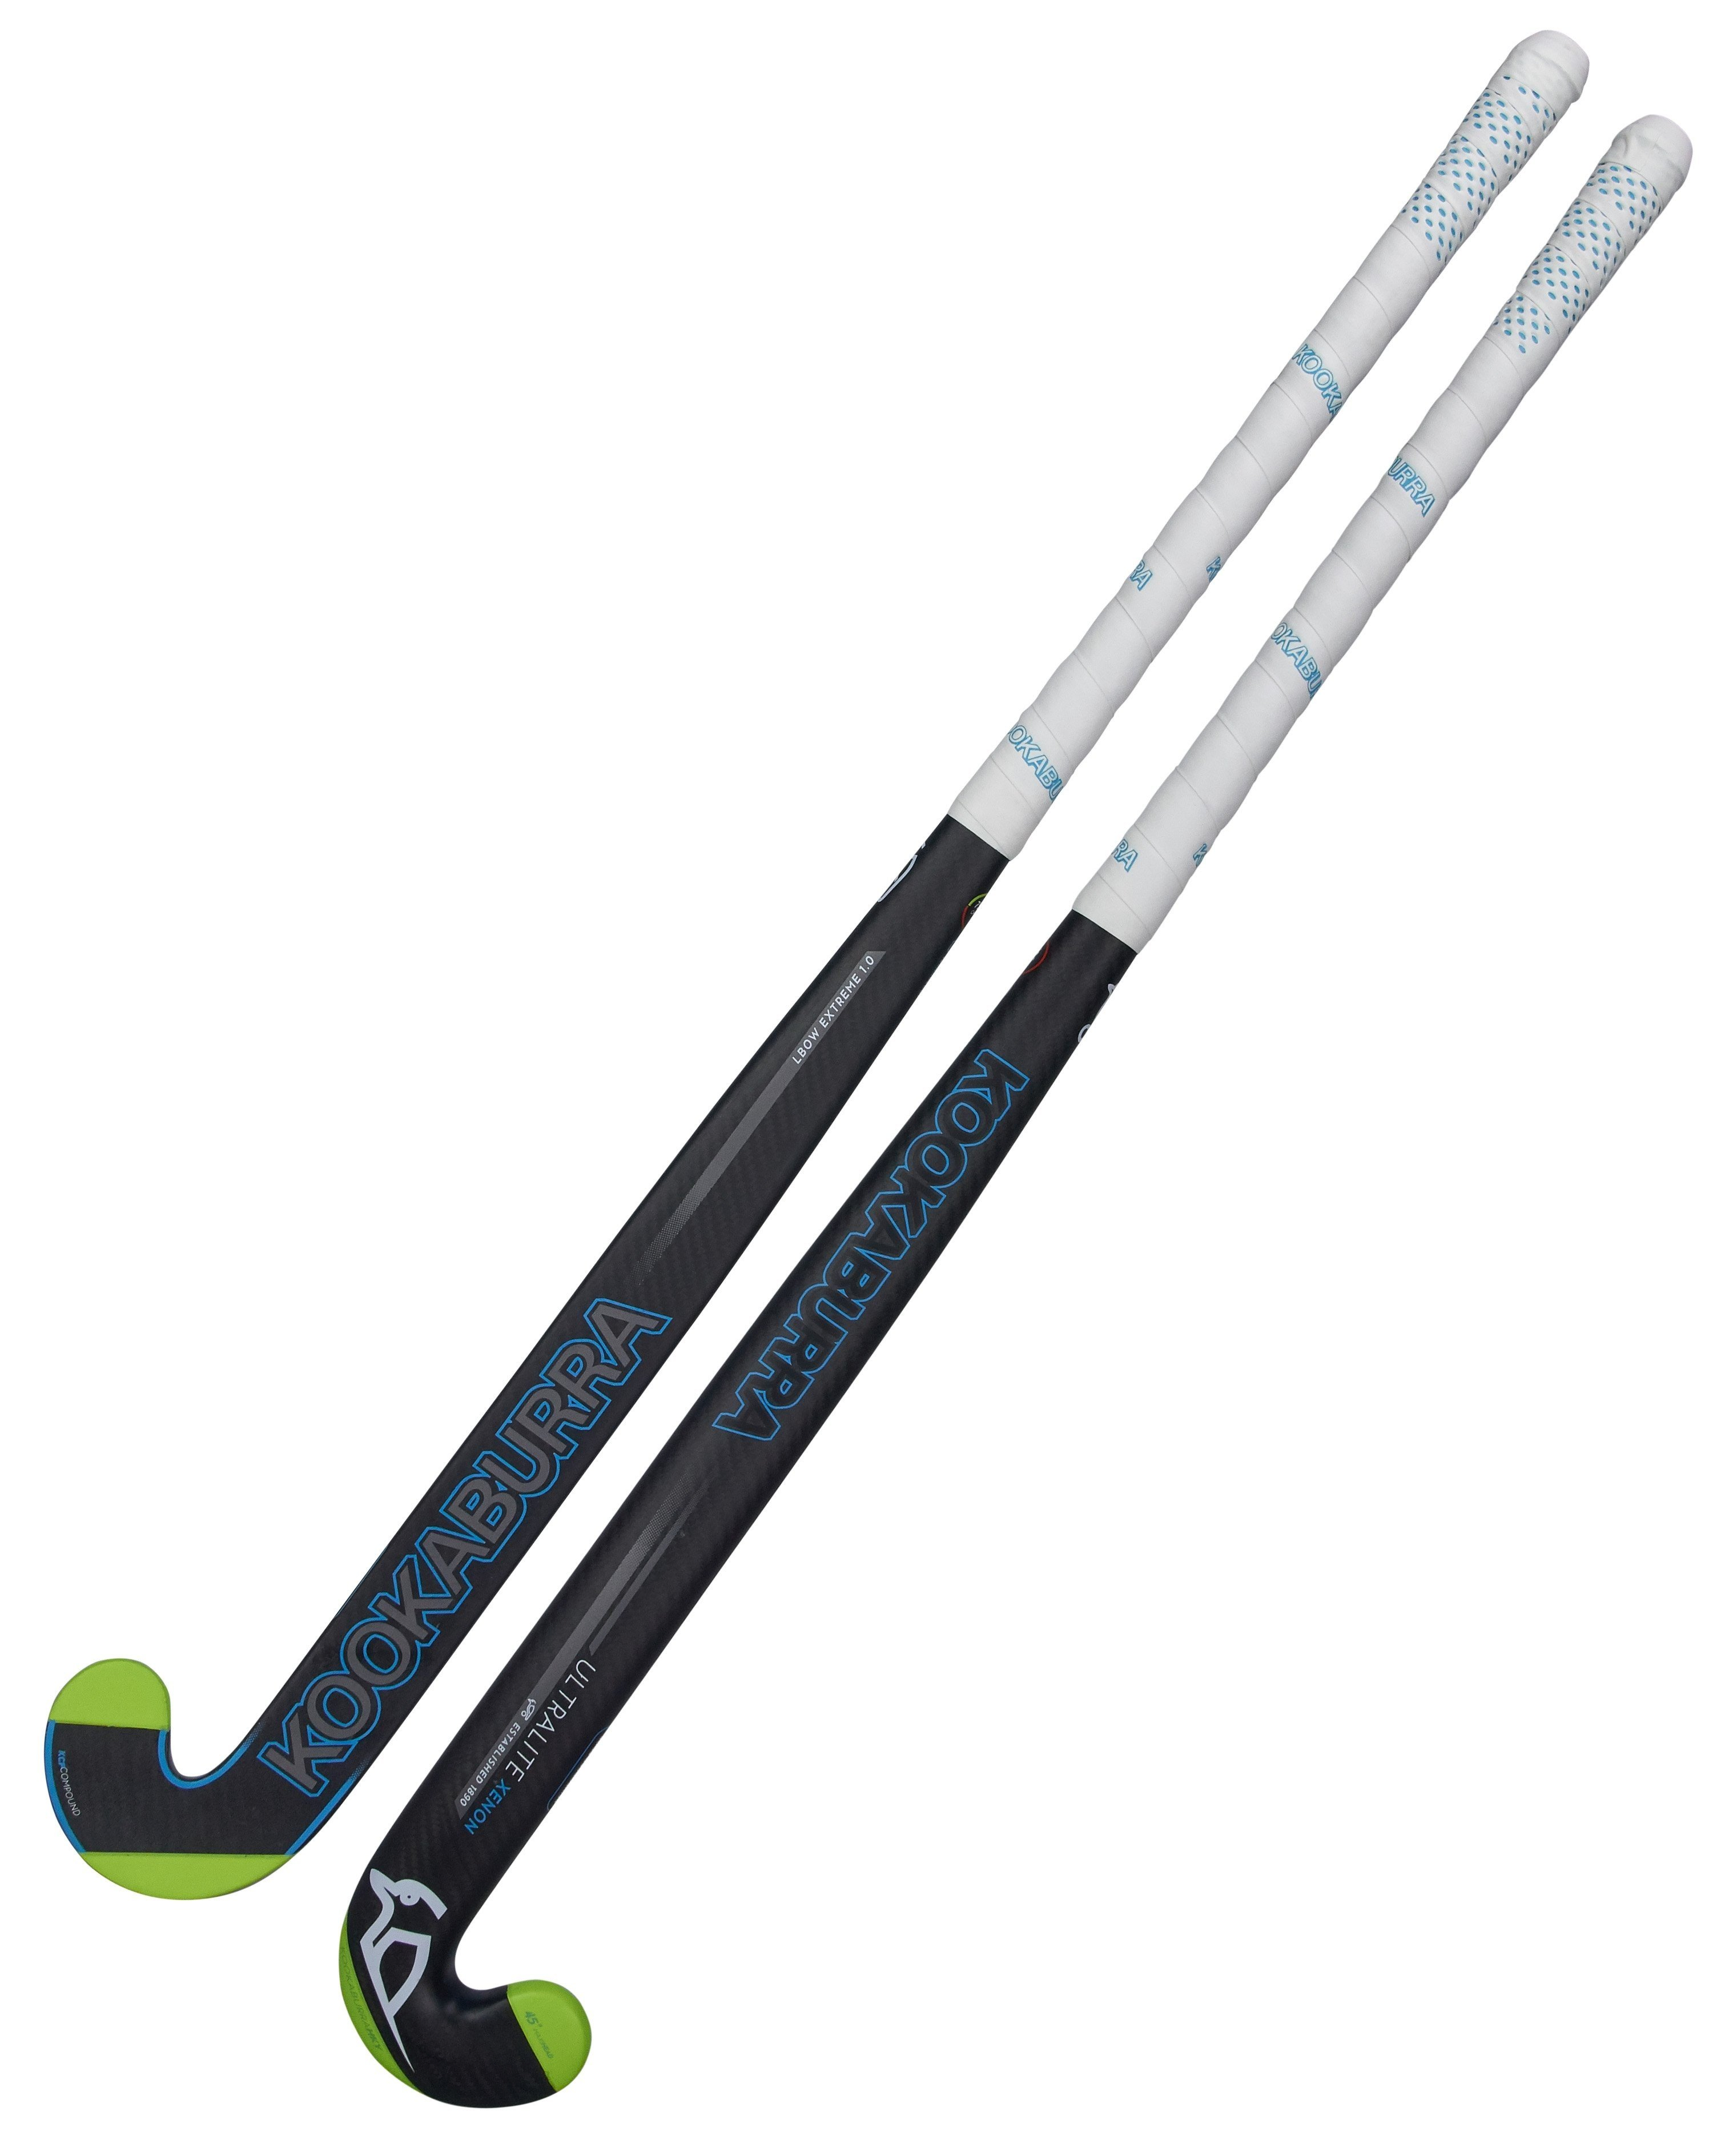 2017/18 Kookaburra Ultralite Xenon - UL Lbow Extreme 1.0 Hockey Stick